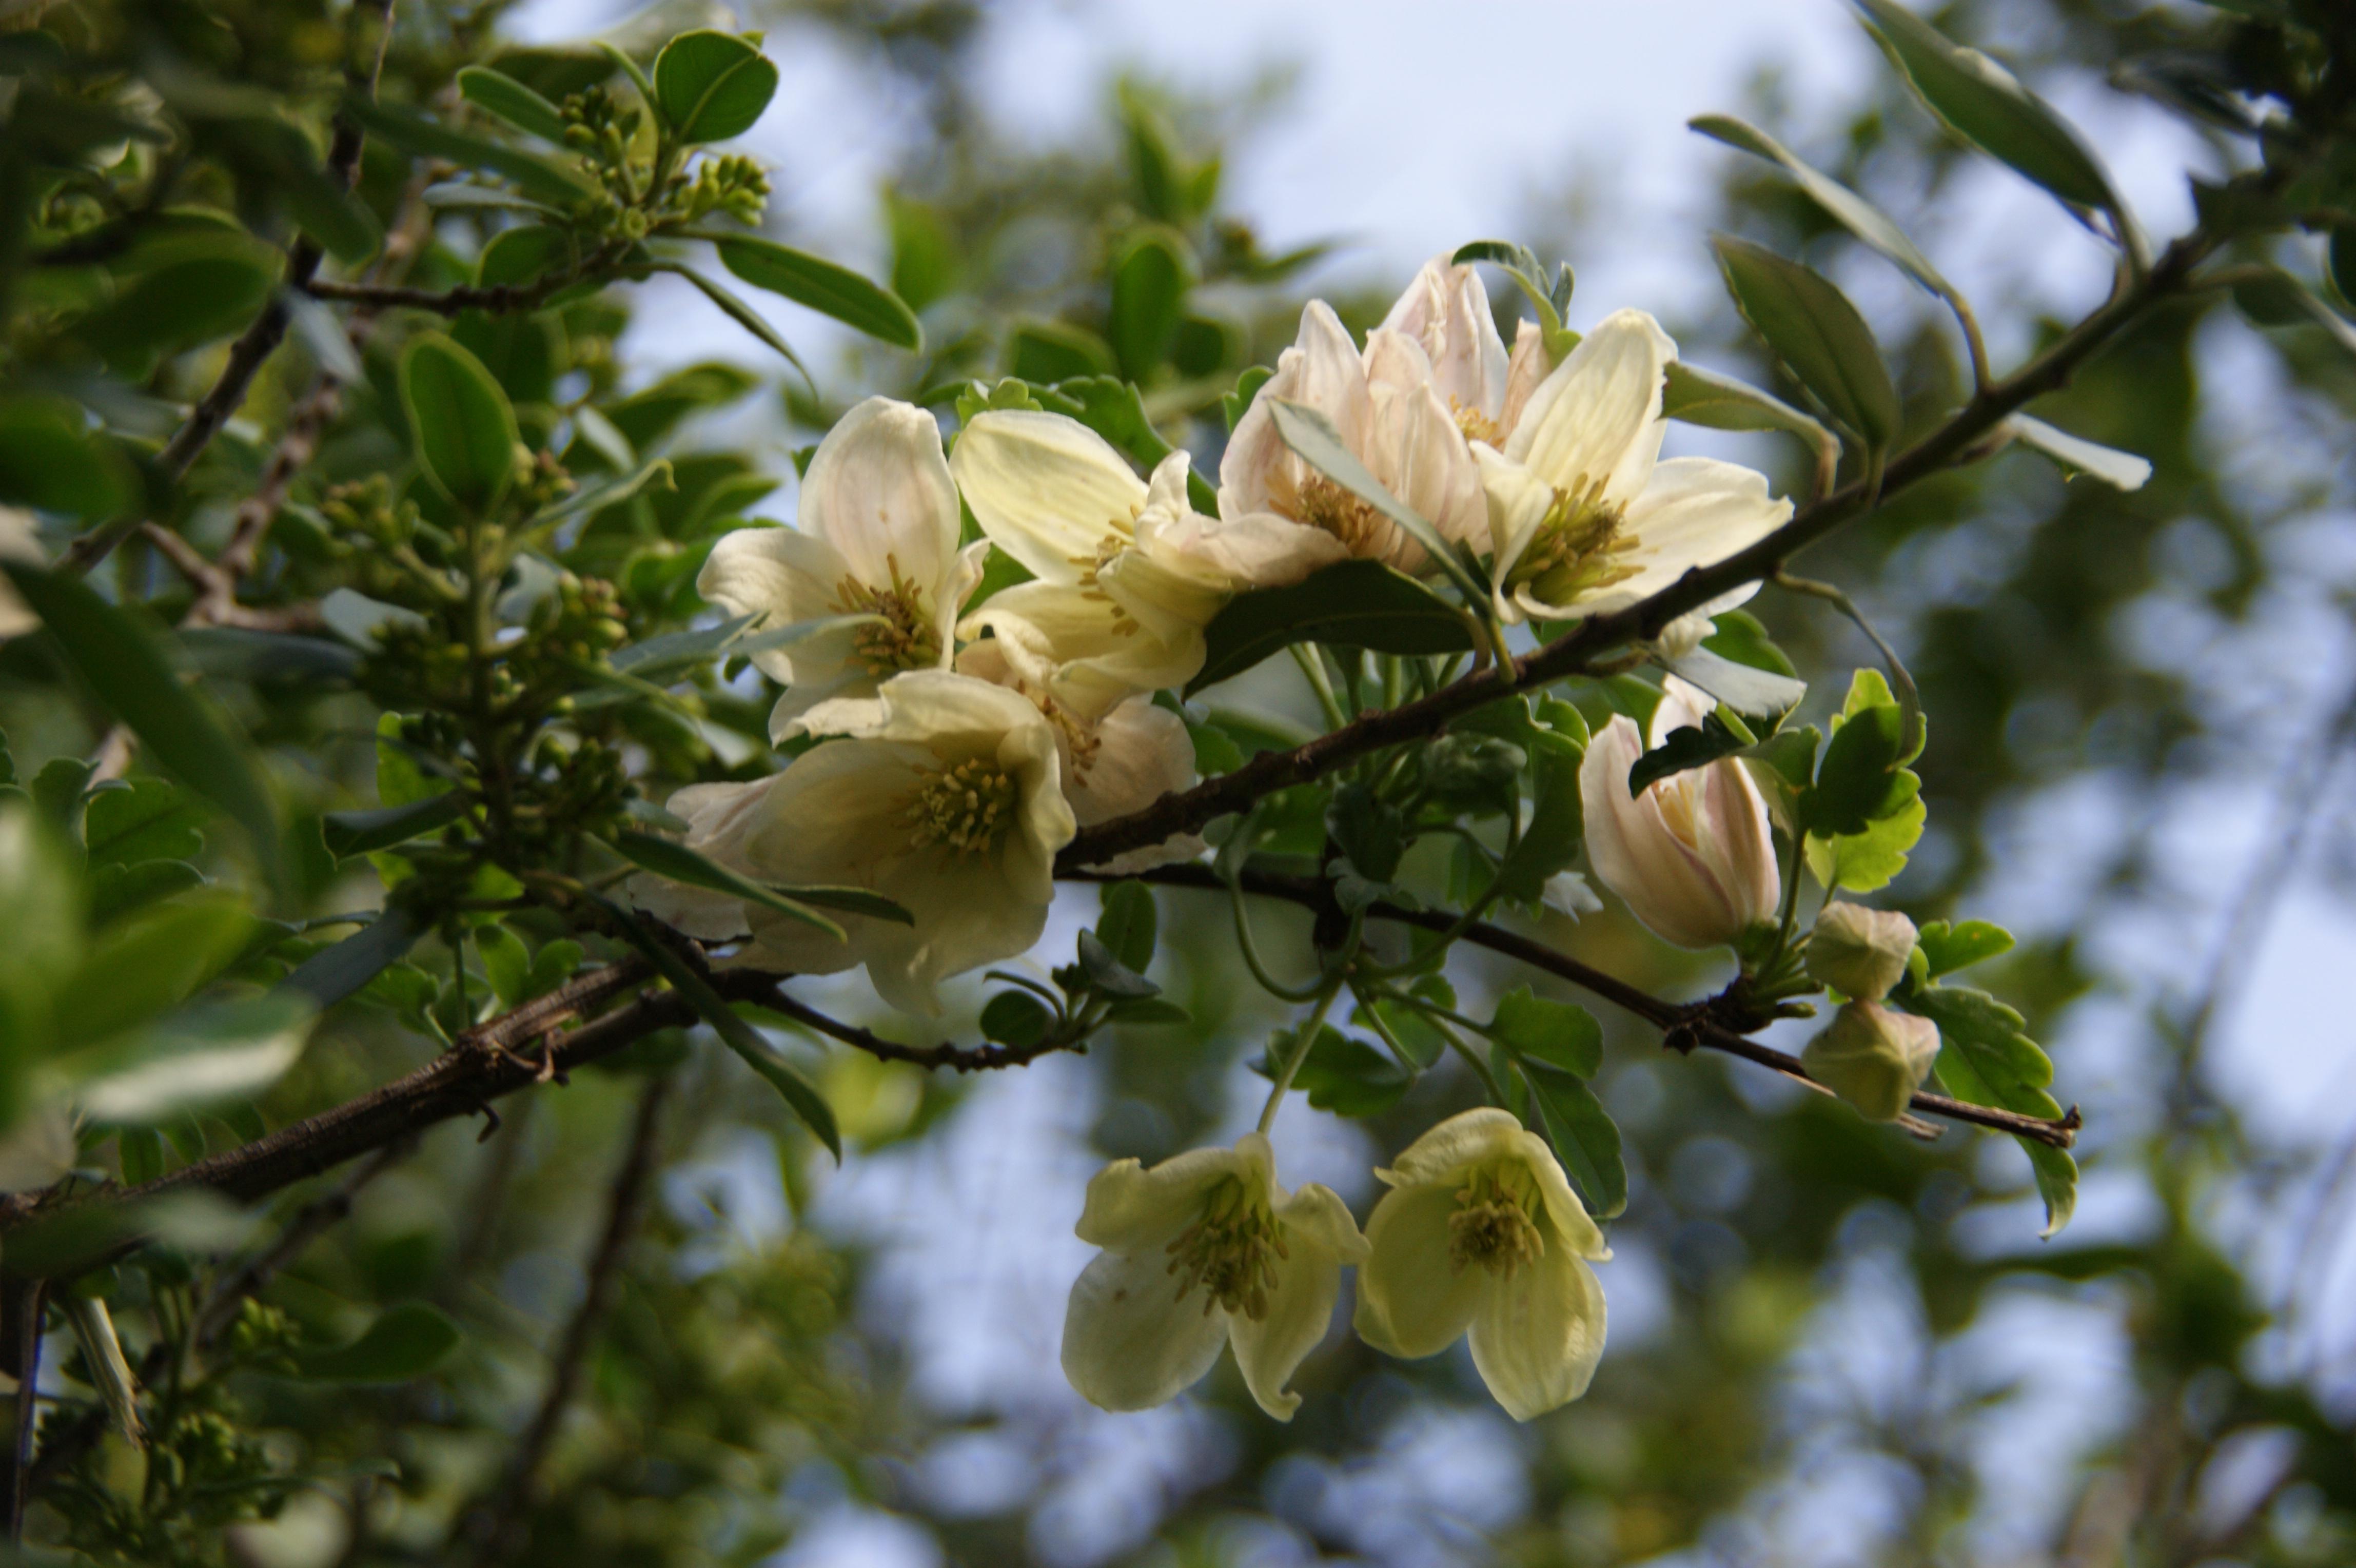 Clematisblüte / Clematis flower